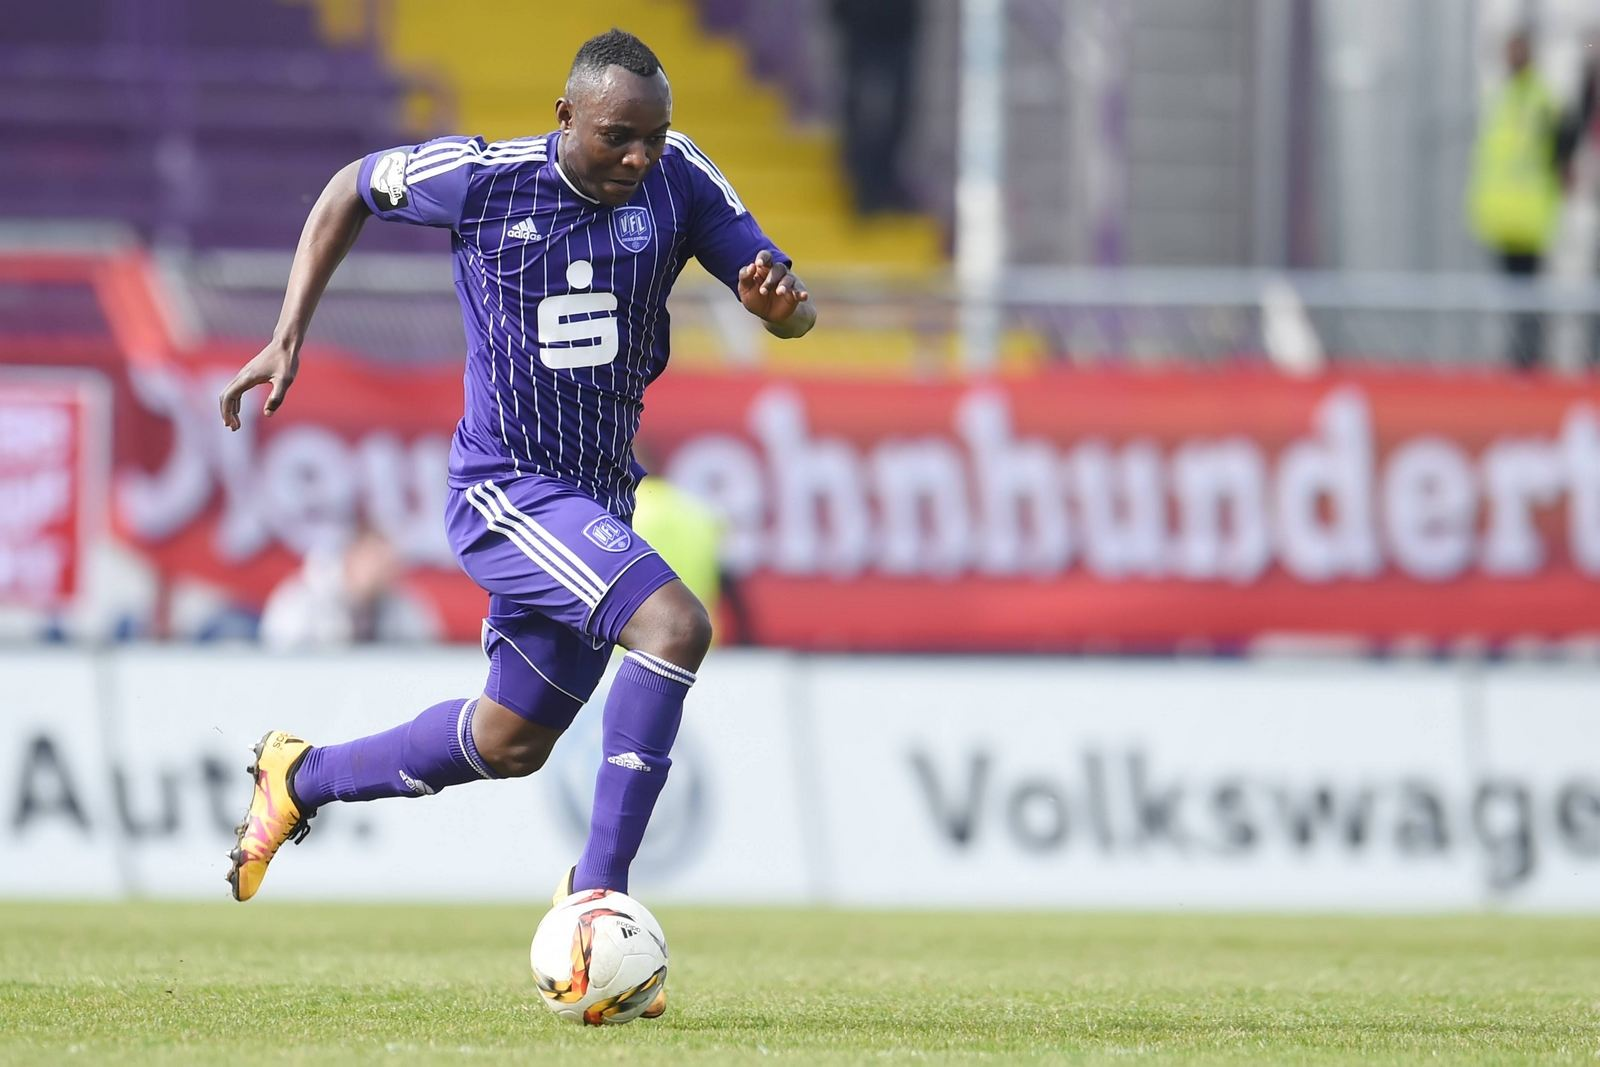 Addy-Waku Menga vom VfL Osnabrück